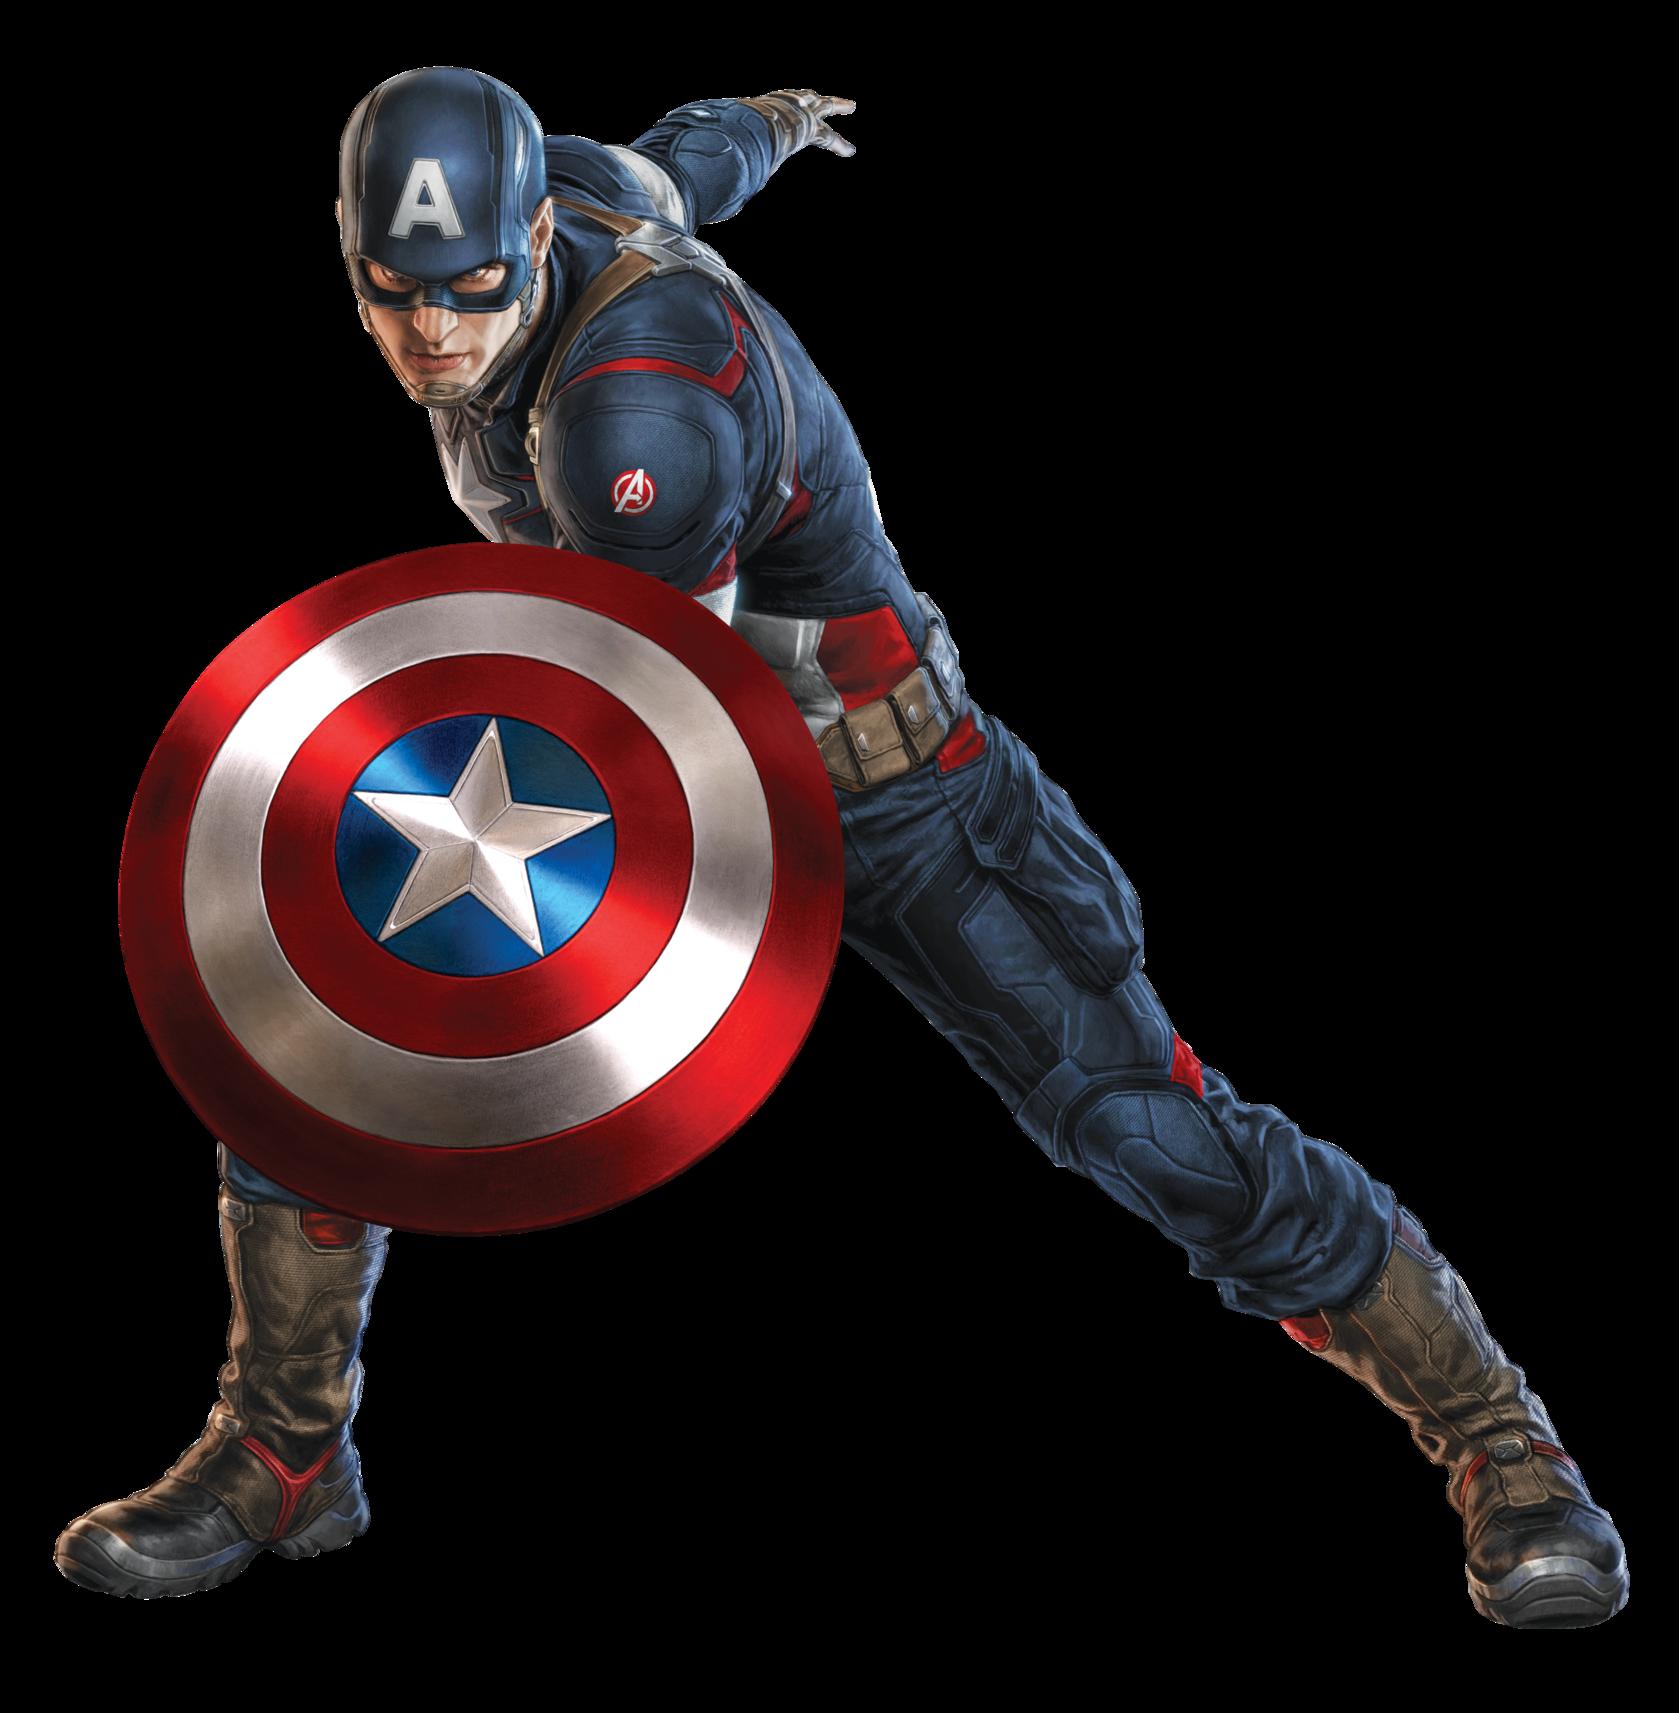 Image aou guard png. Clipart shield captain america